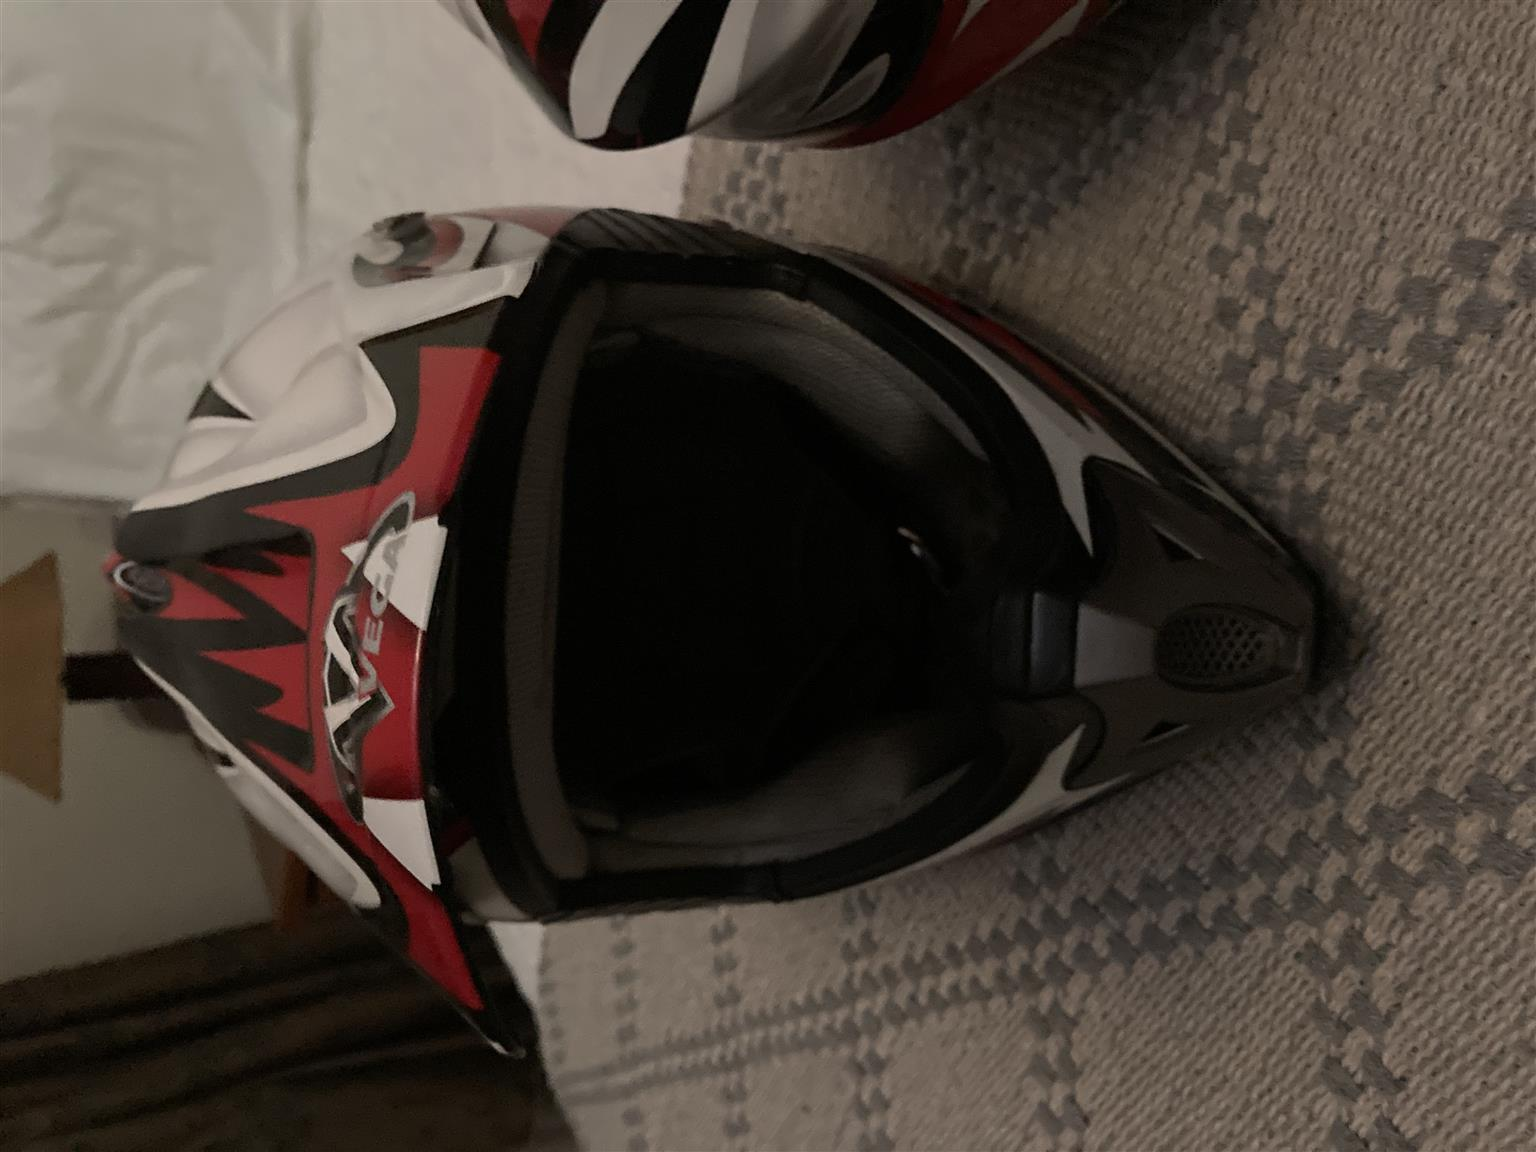 Offroad motorcycle helmets